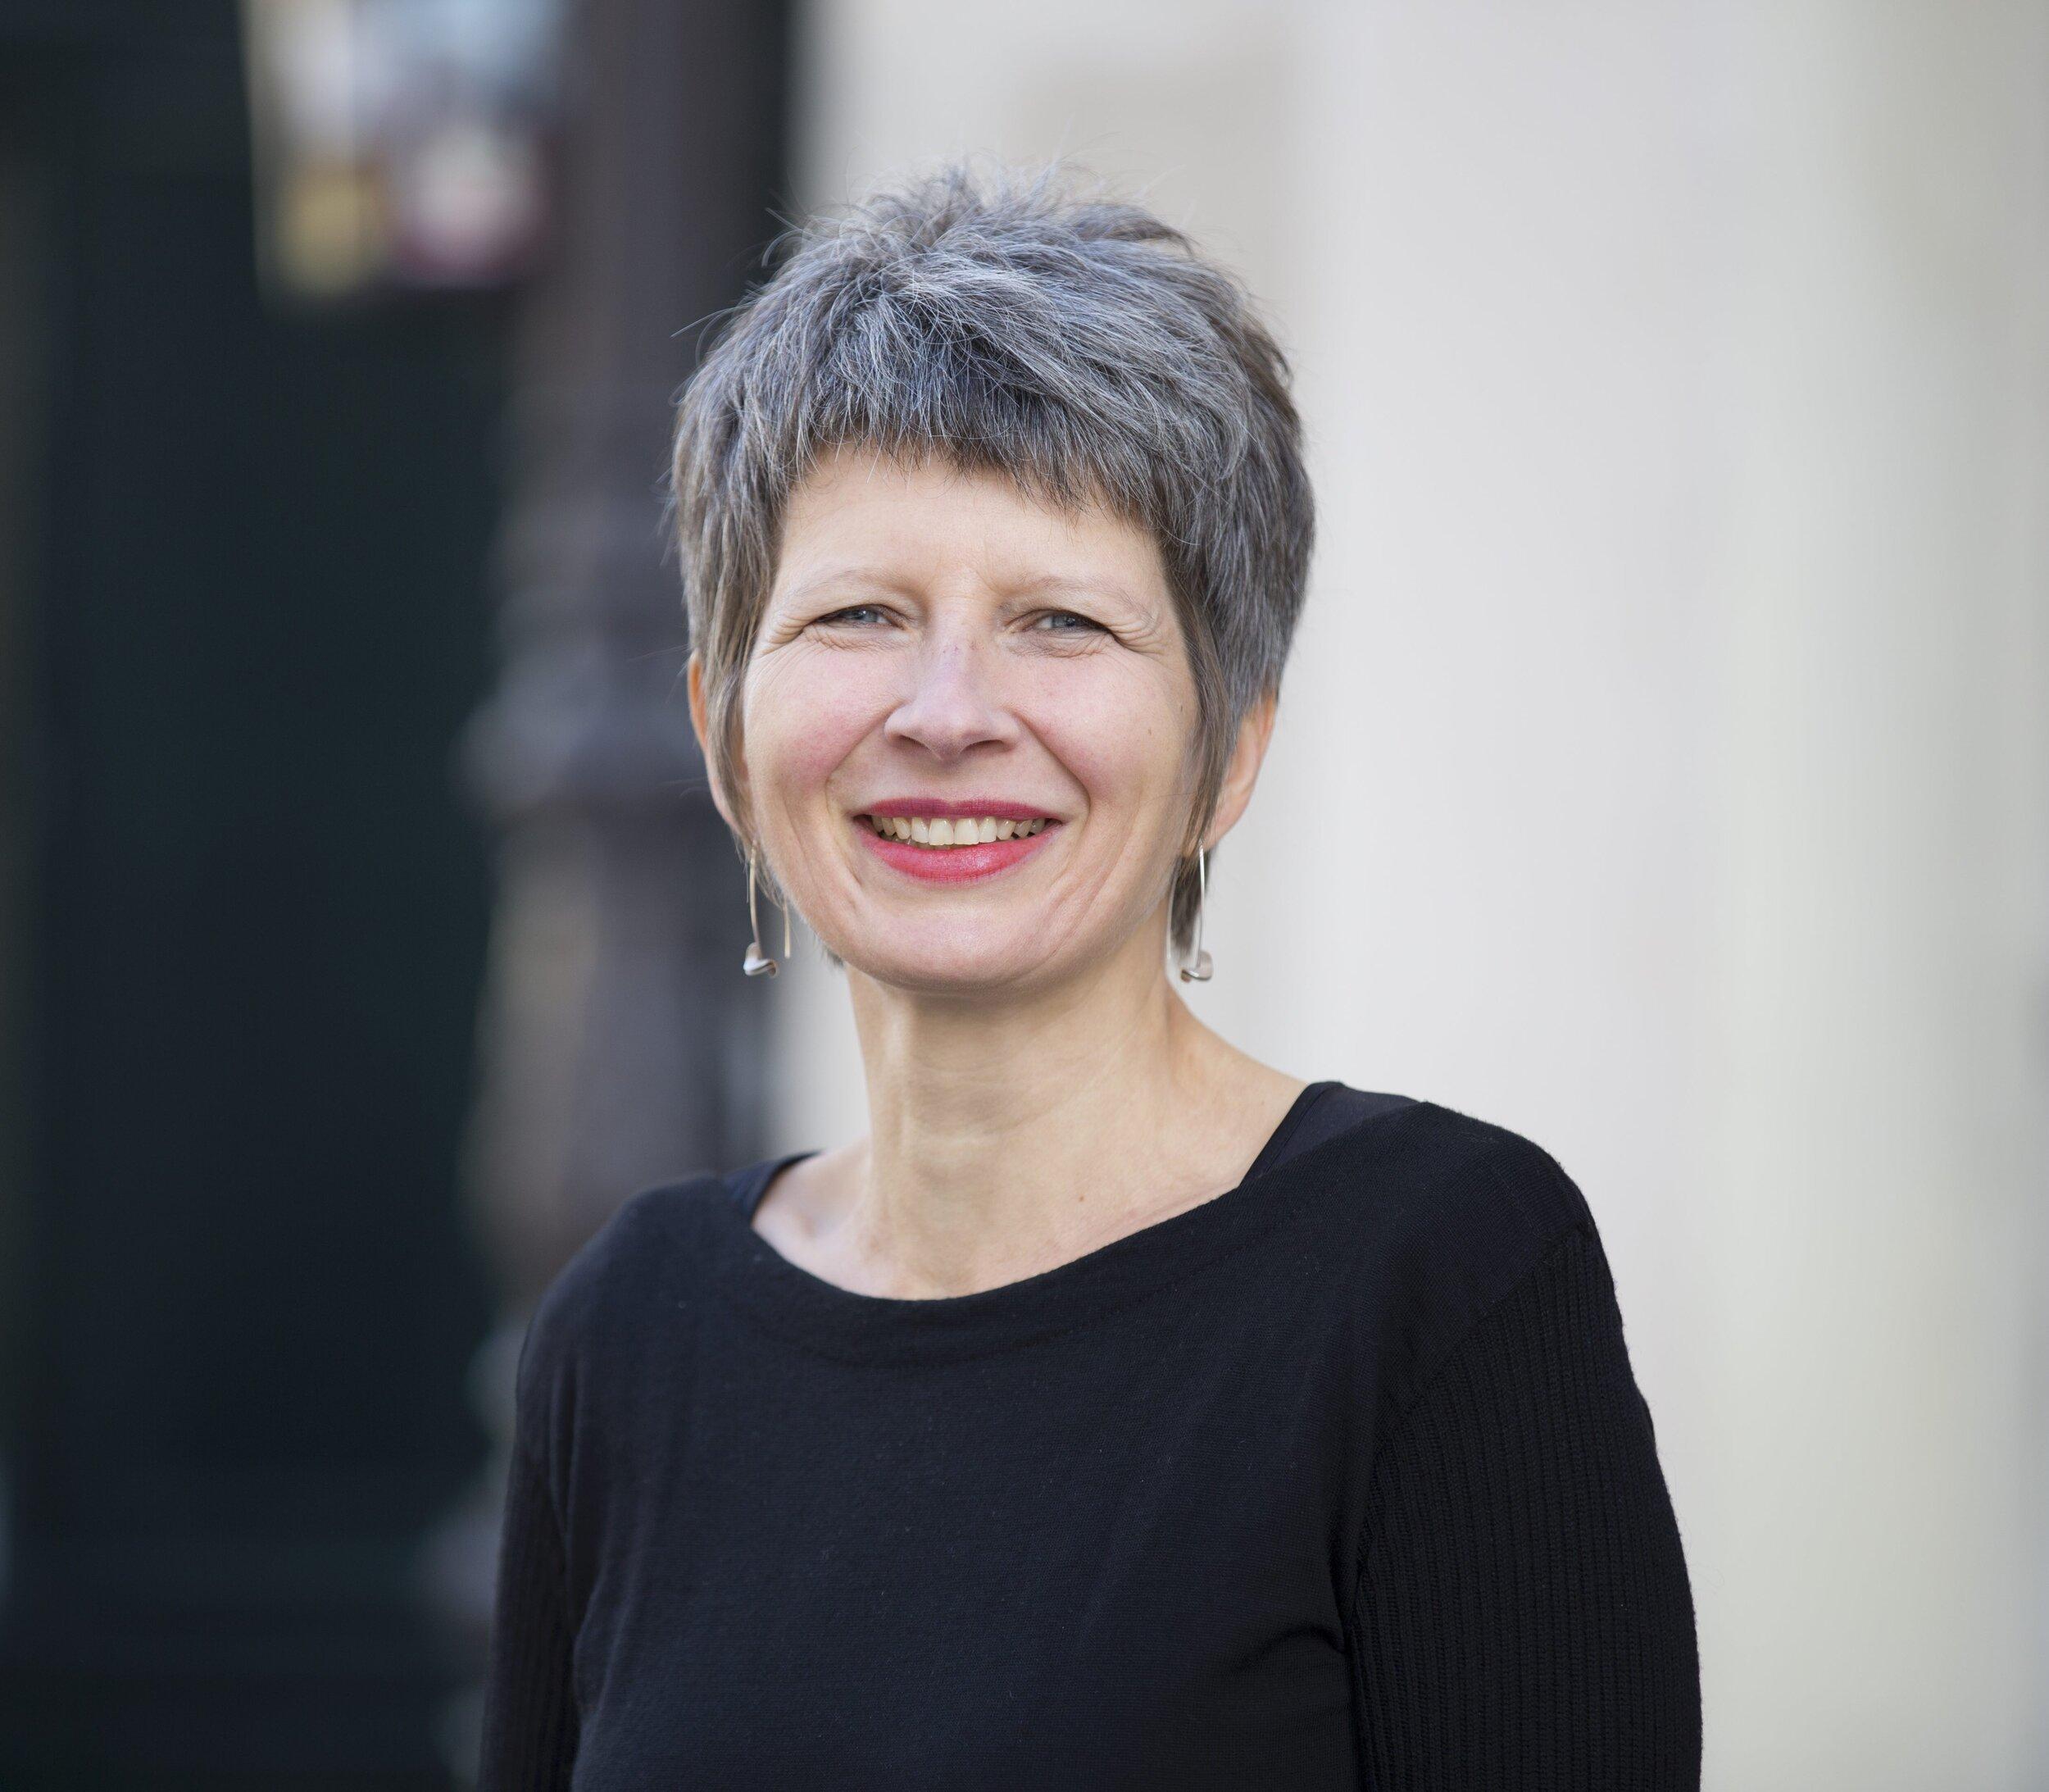 Maria Lund. Image courtesy Helene Schmitz, 11.2013